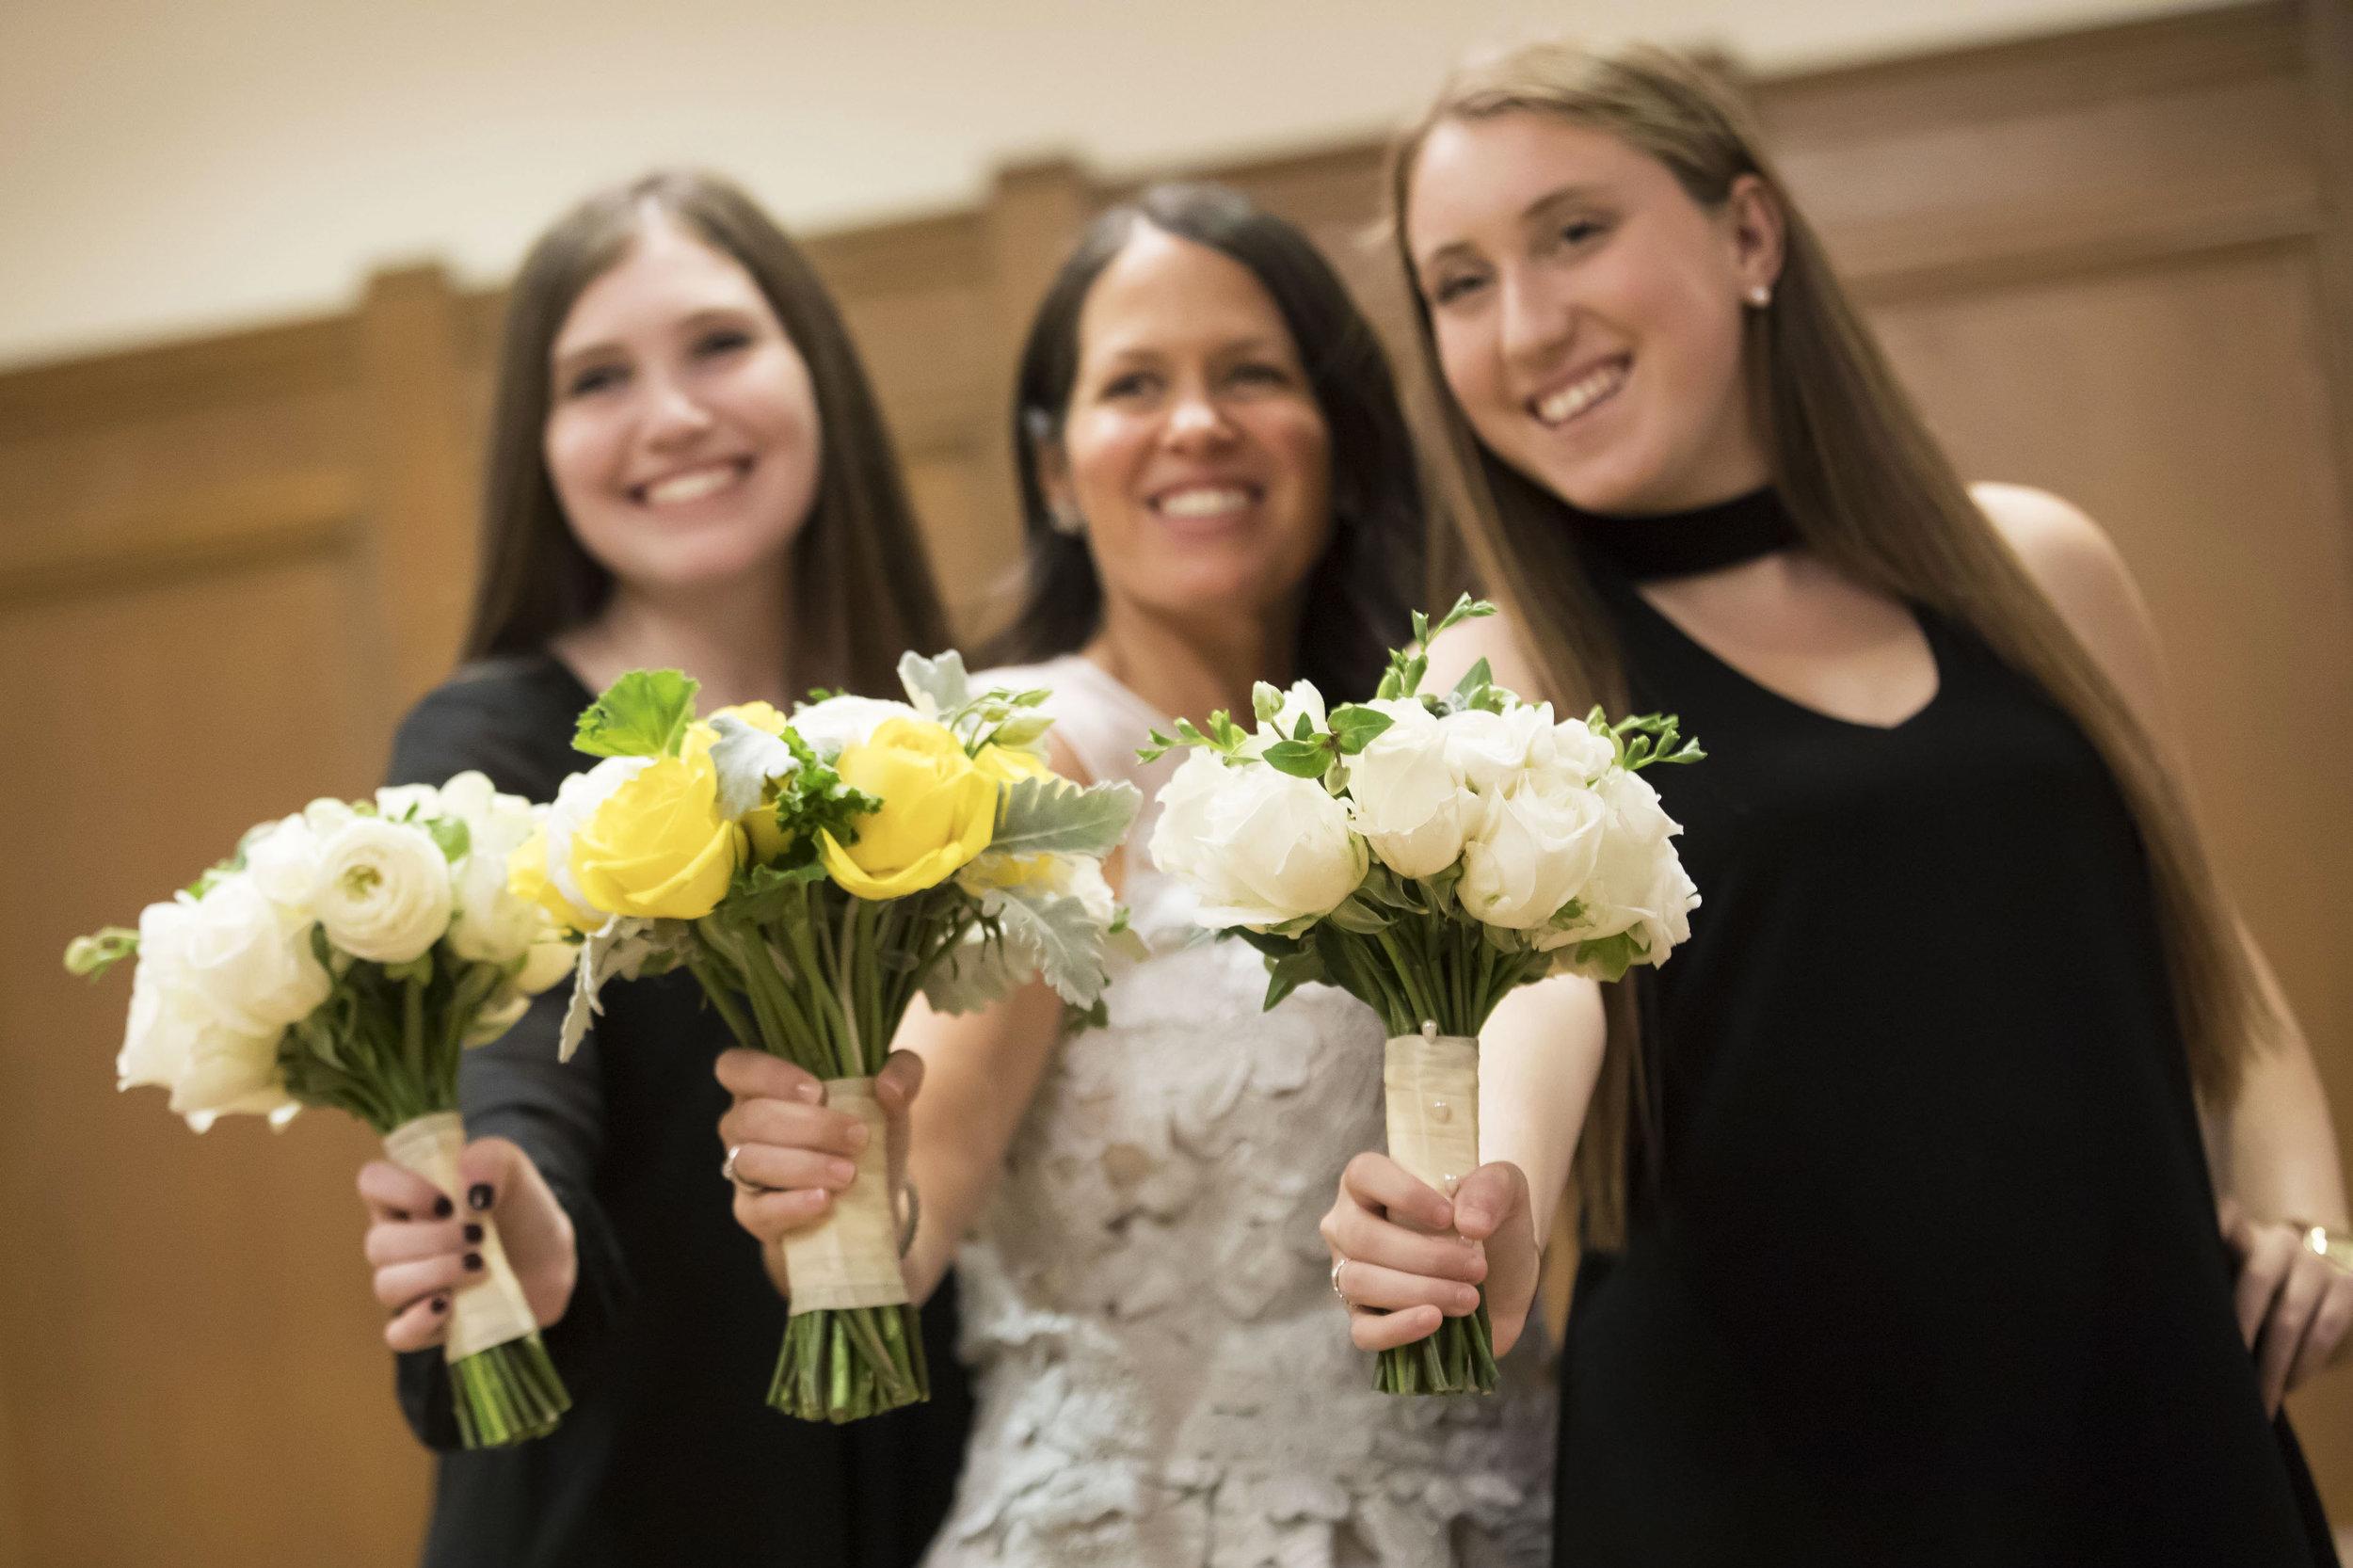 synagogue-wedding-photographer-1220.JPG